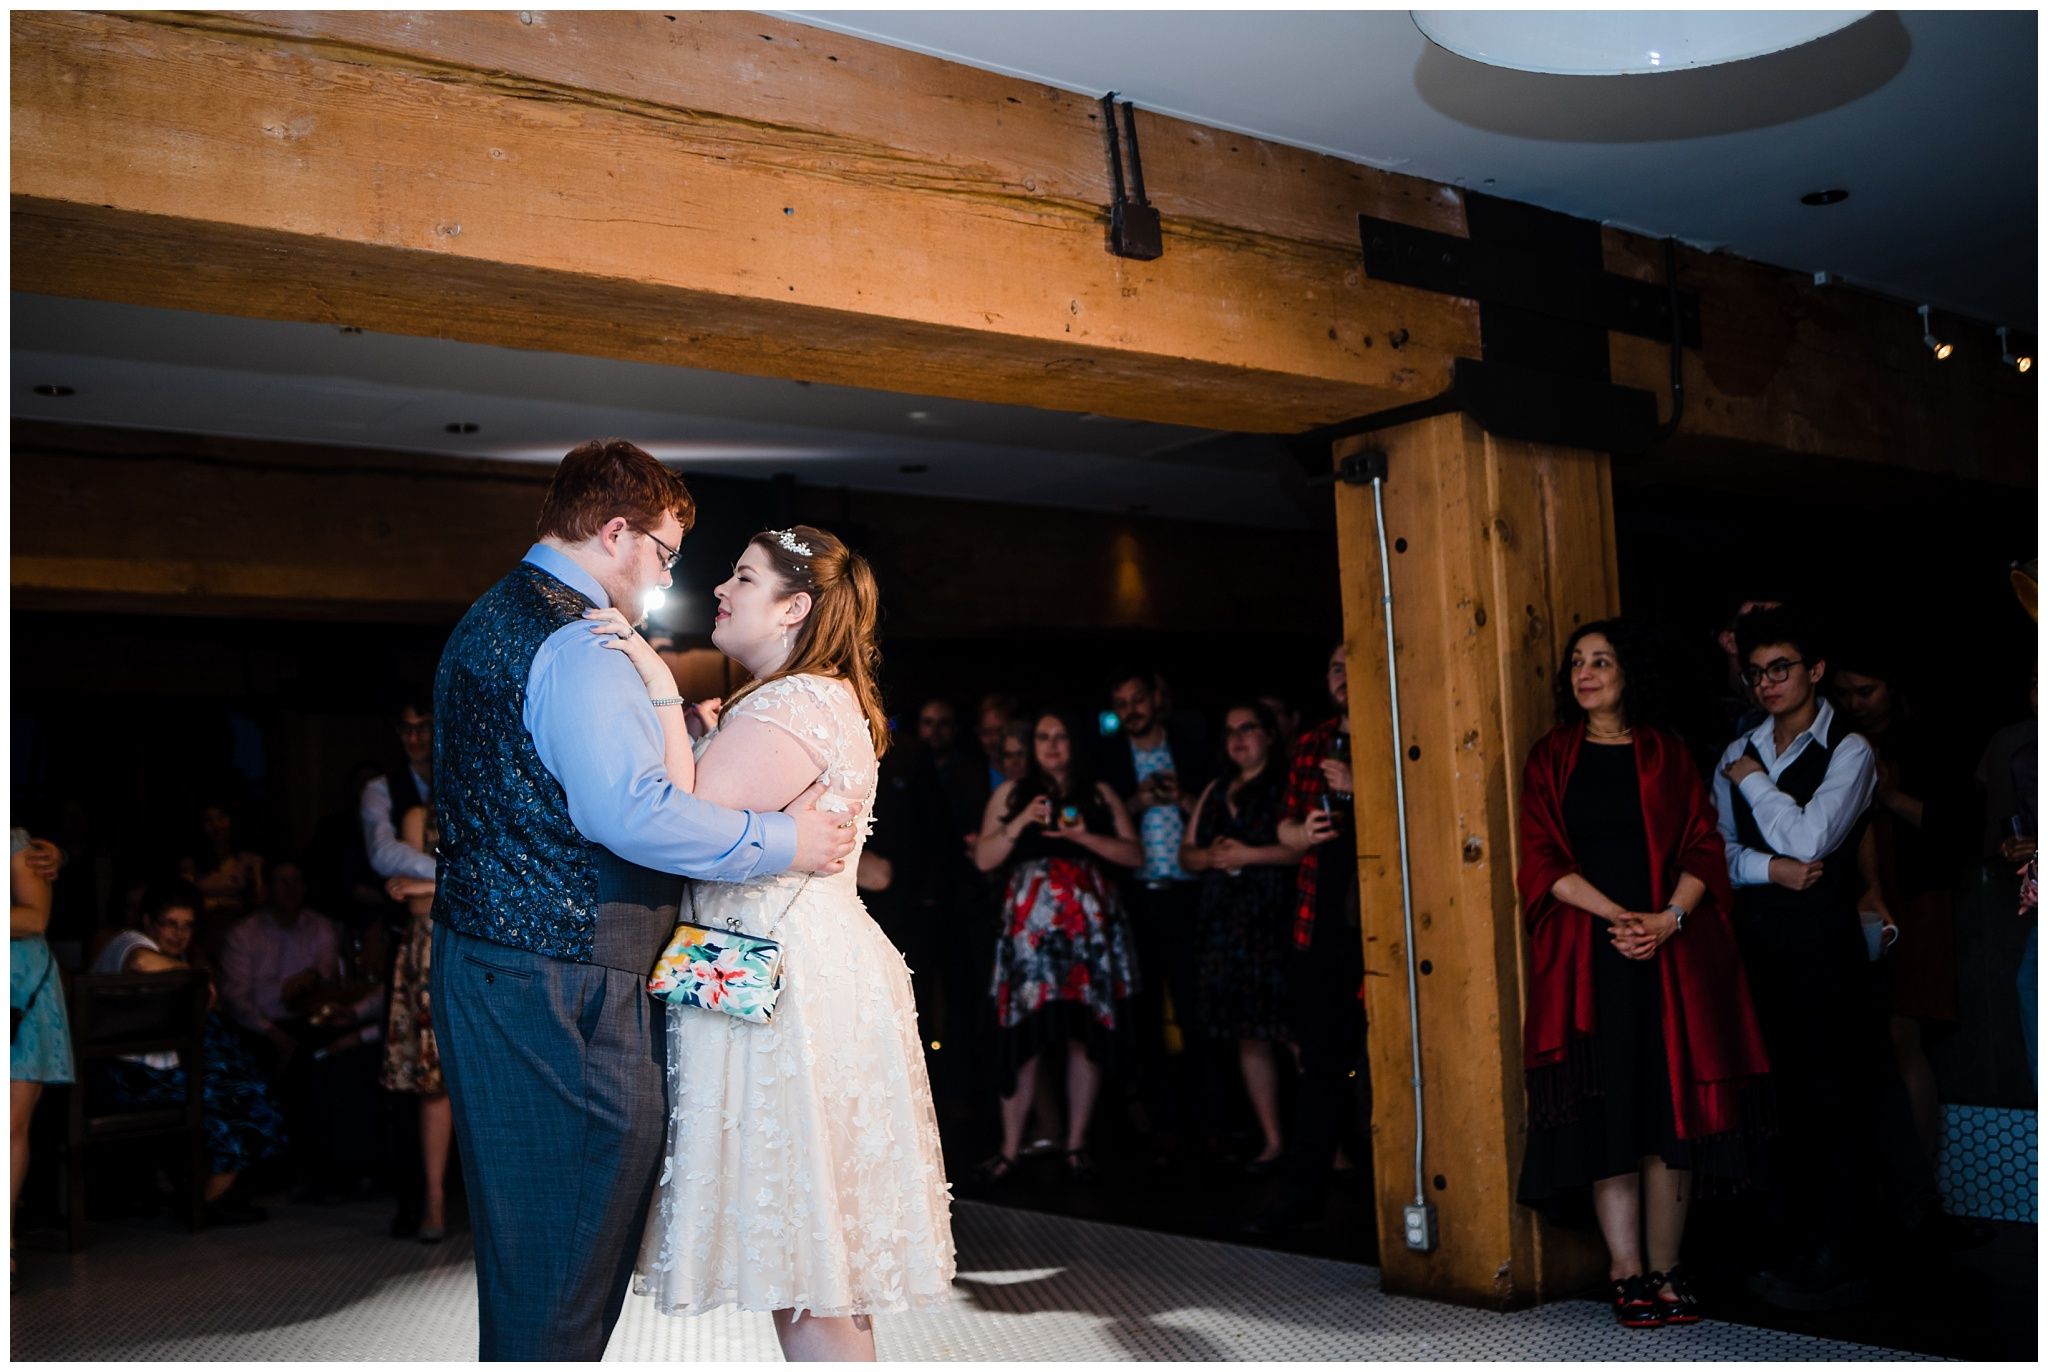 The Loft at Earls Wedding Yaletown BC Photographer_0027.jpg